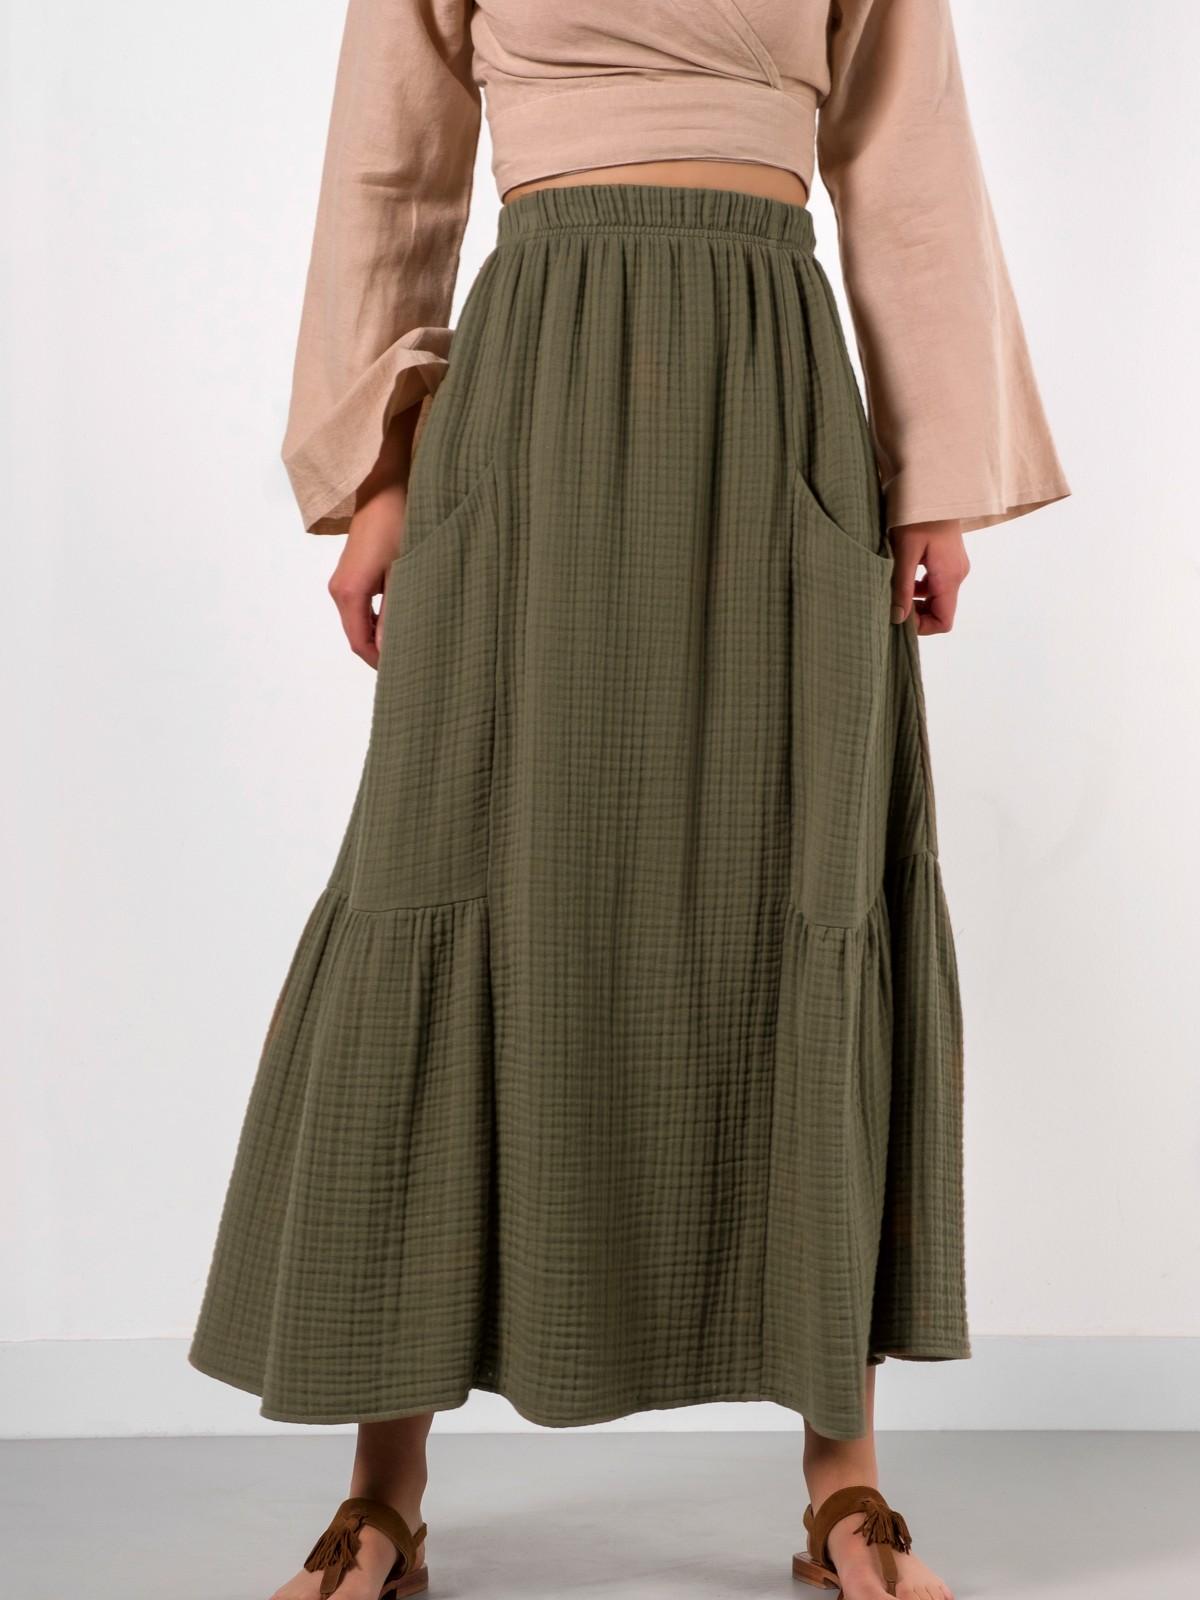 alba-skirt-khaki3-1200x1600w